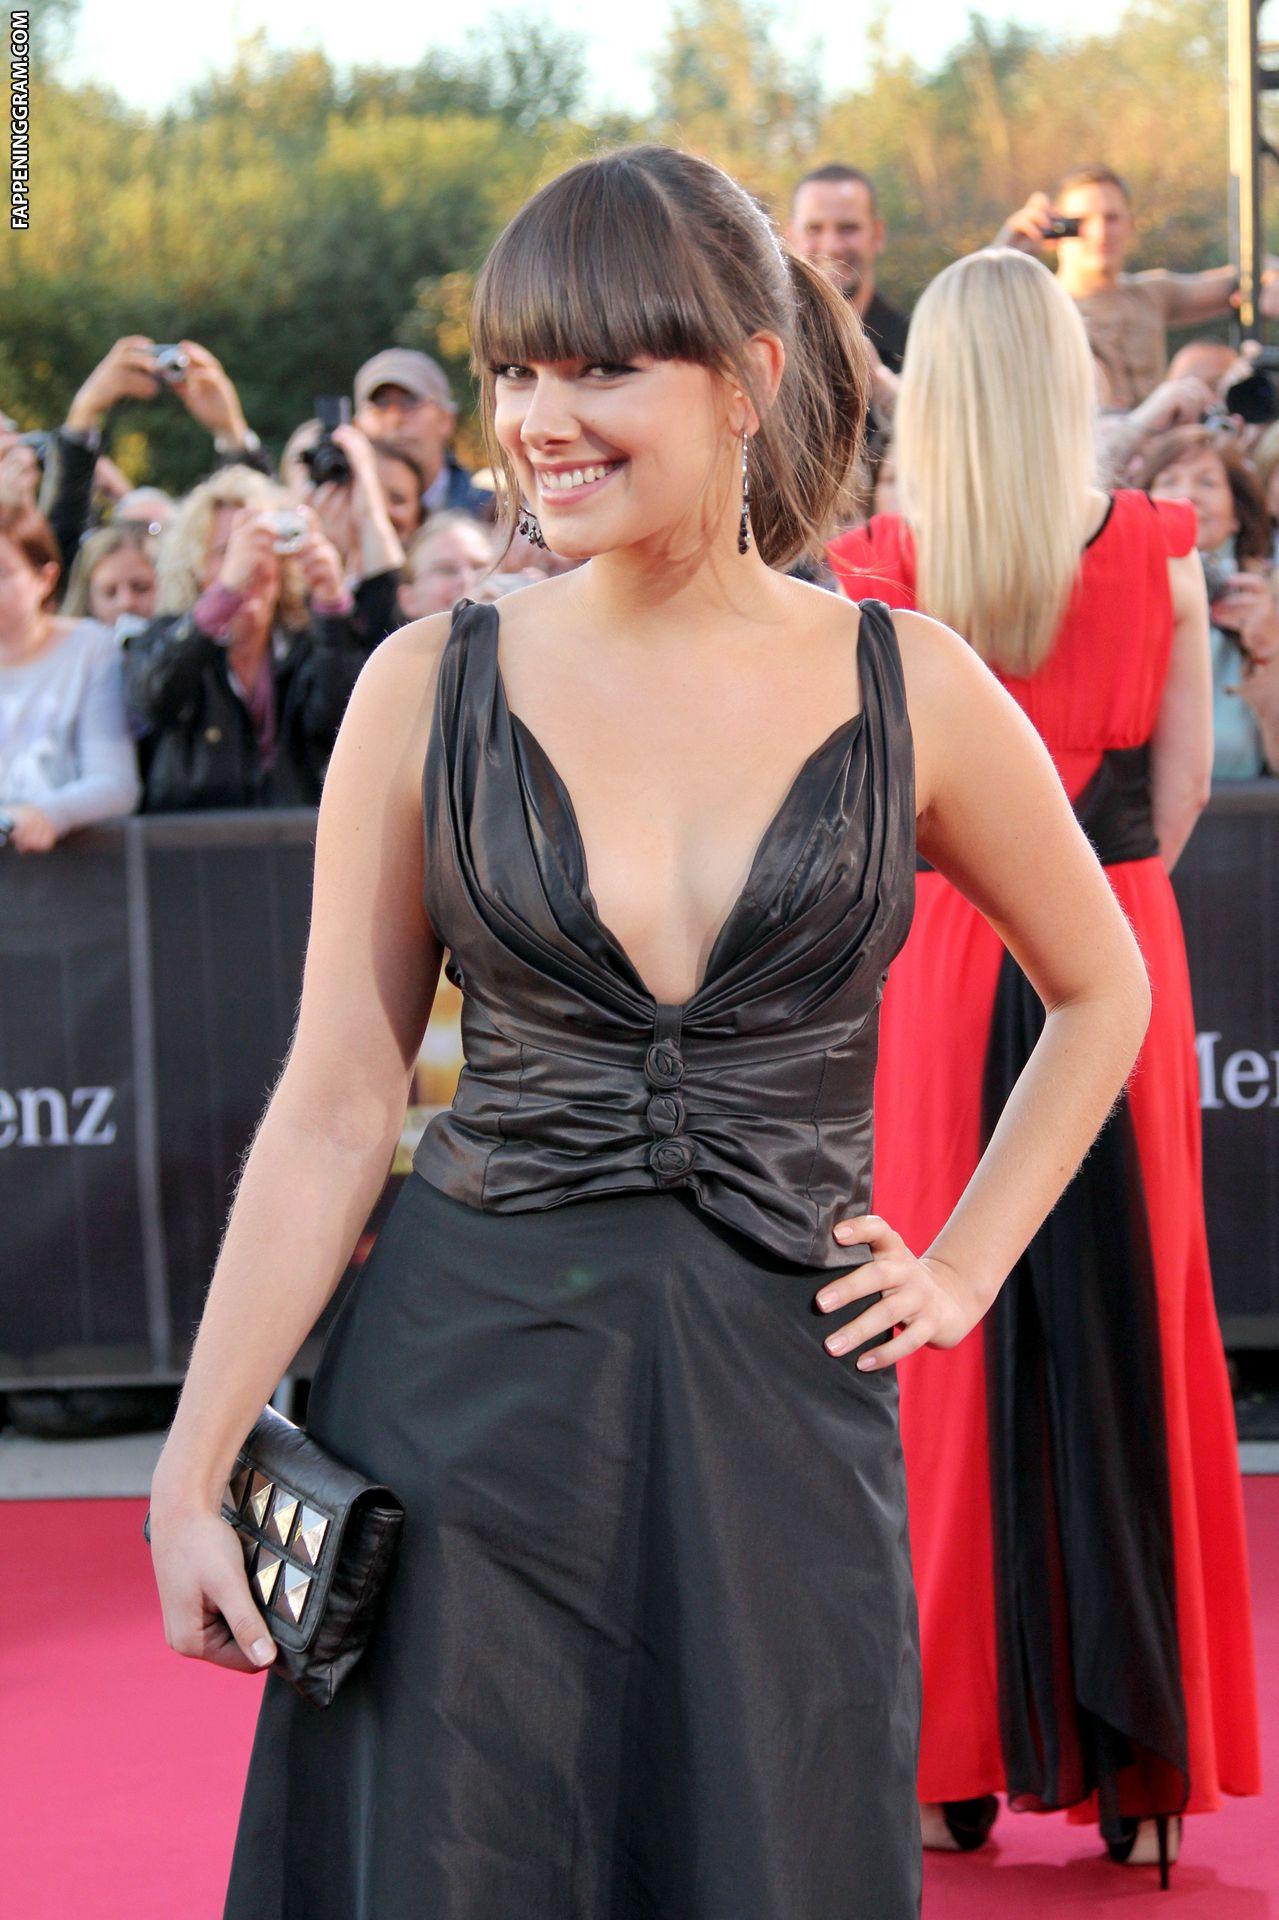 Janina Uhse Nude The Fappening - FappeningGram